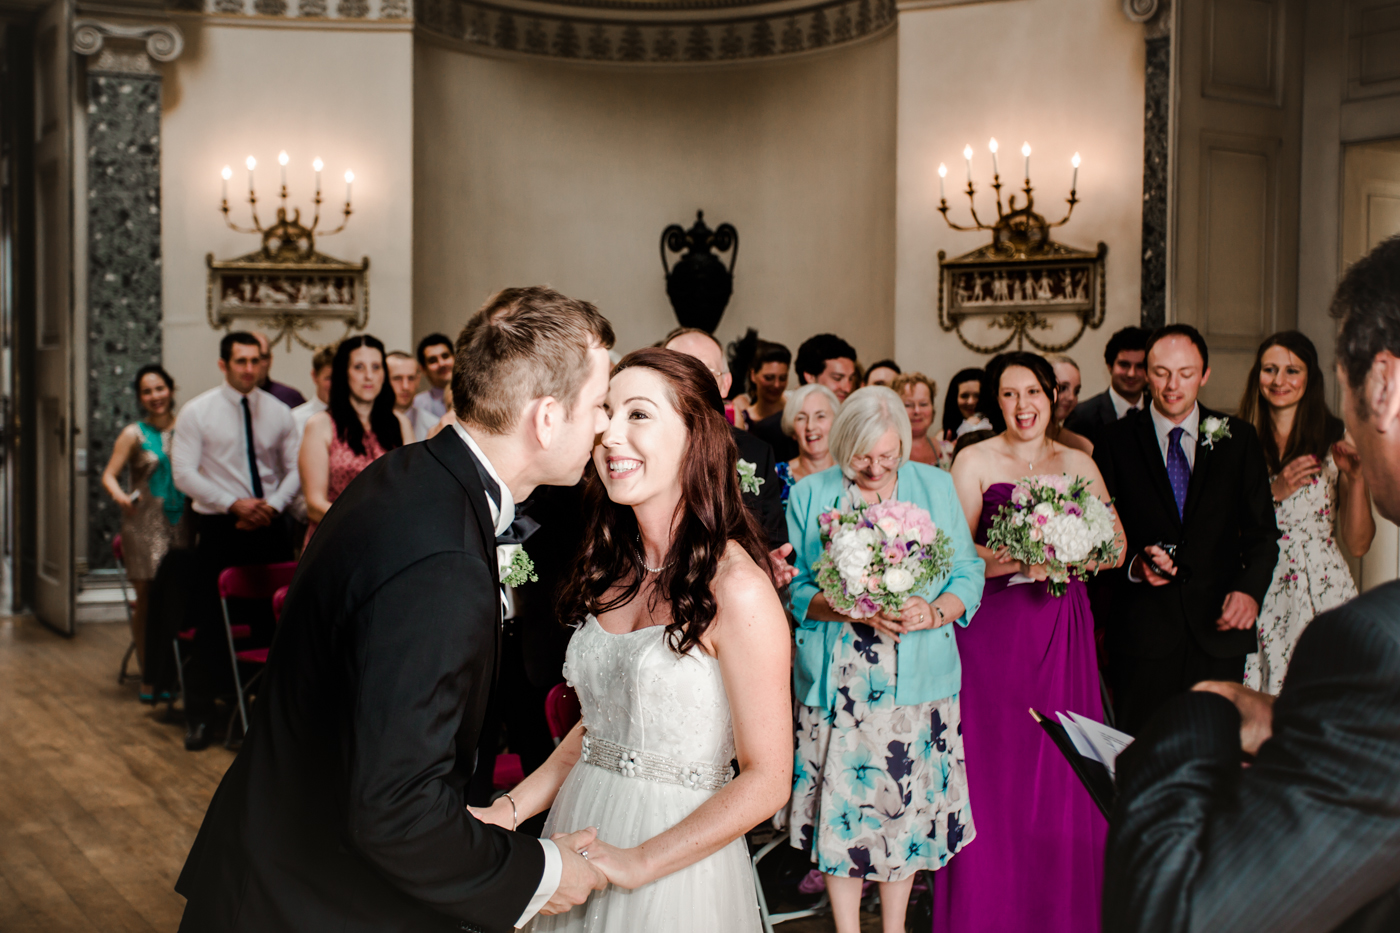 062 - Abi and Chris at Kedleston Hall - Wedding Photography by Mark Pugh www.markpugh.com - 0172.JPG